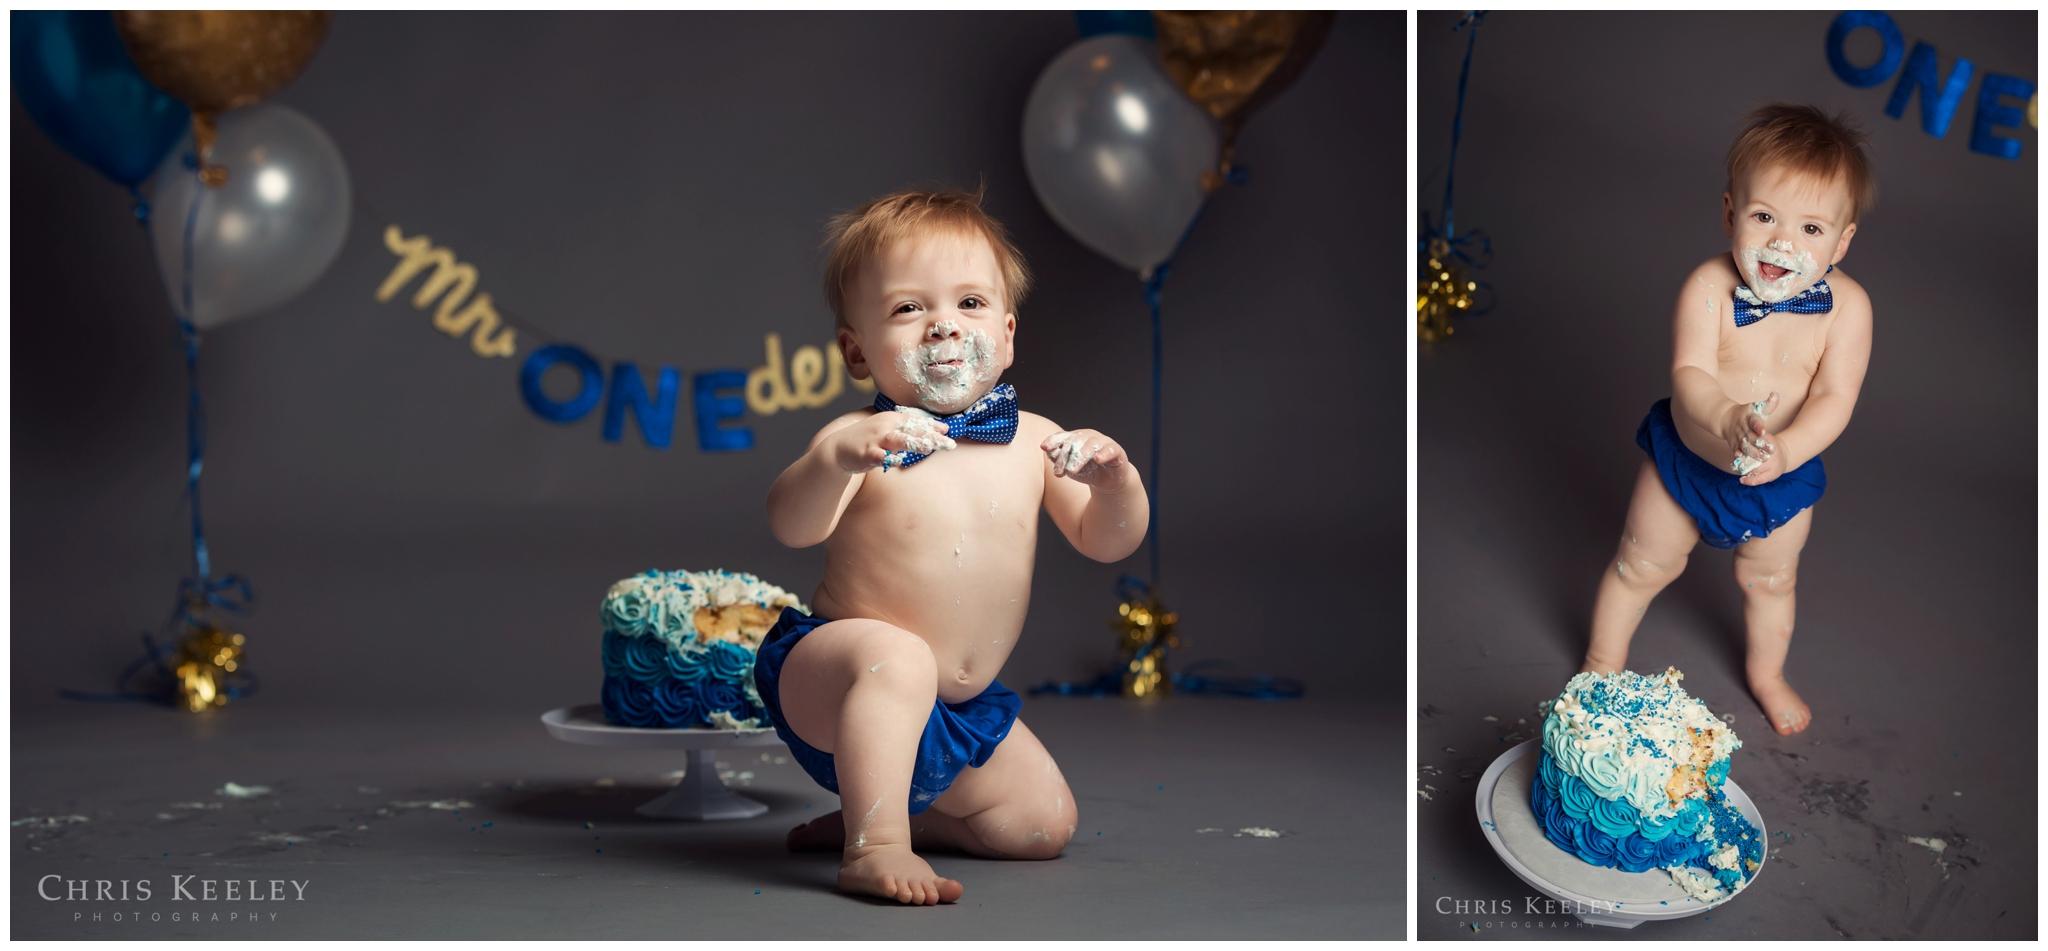 cake-smash-family-photographer-dover-new-hampshire-02.jpg